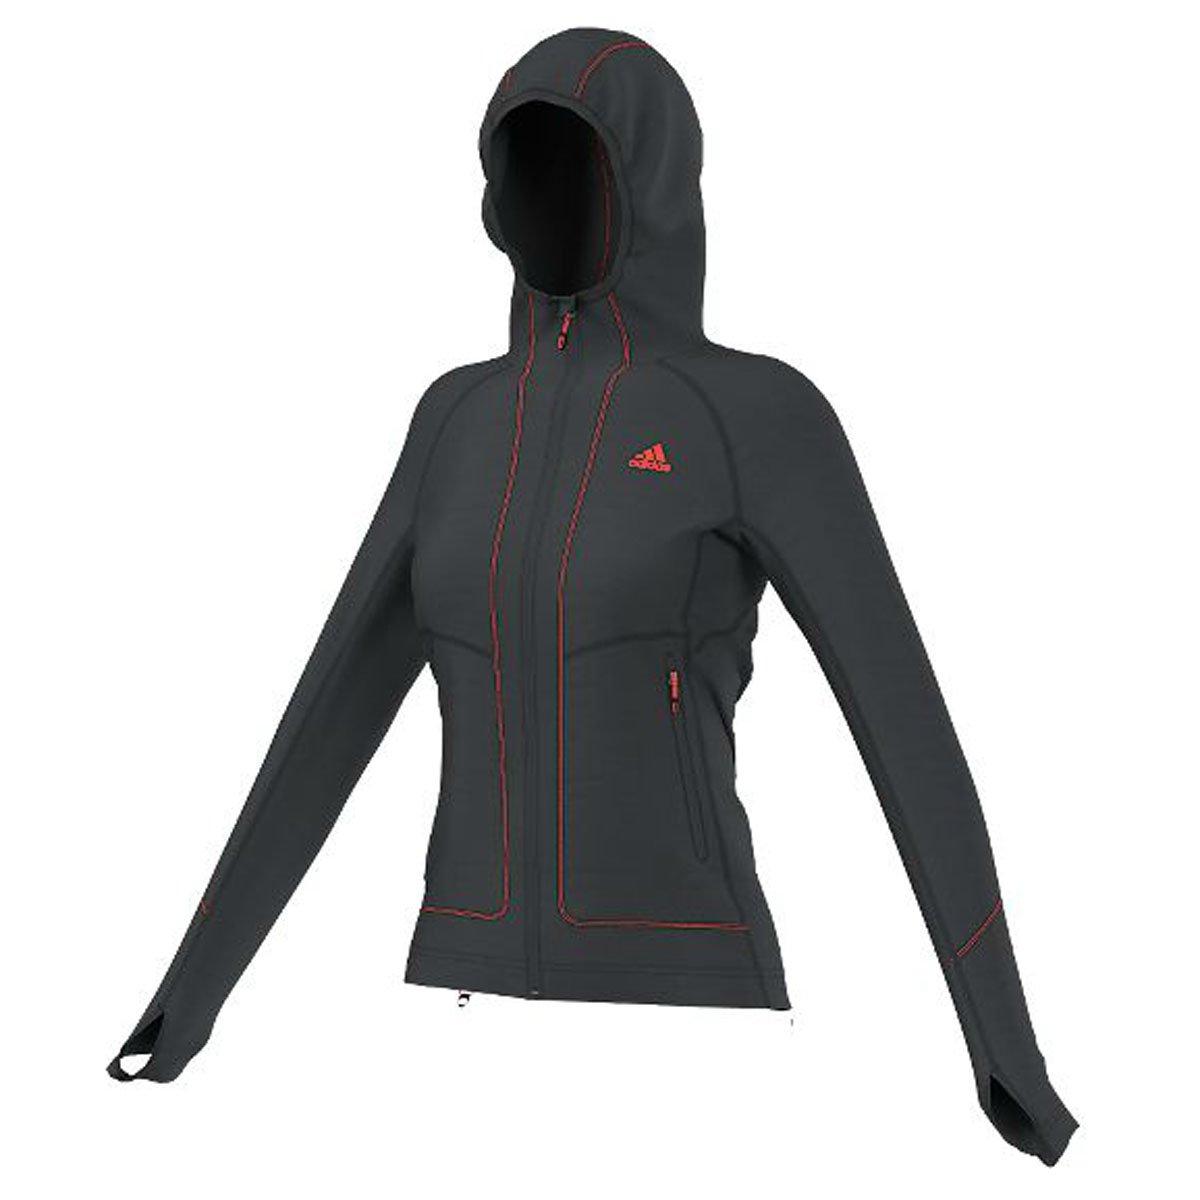 adidas outdoor Women's Terrex Swift Pordoi Hooded Fleece Jacket